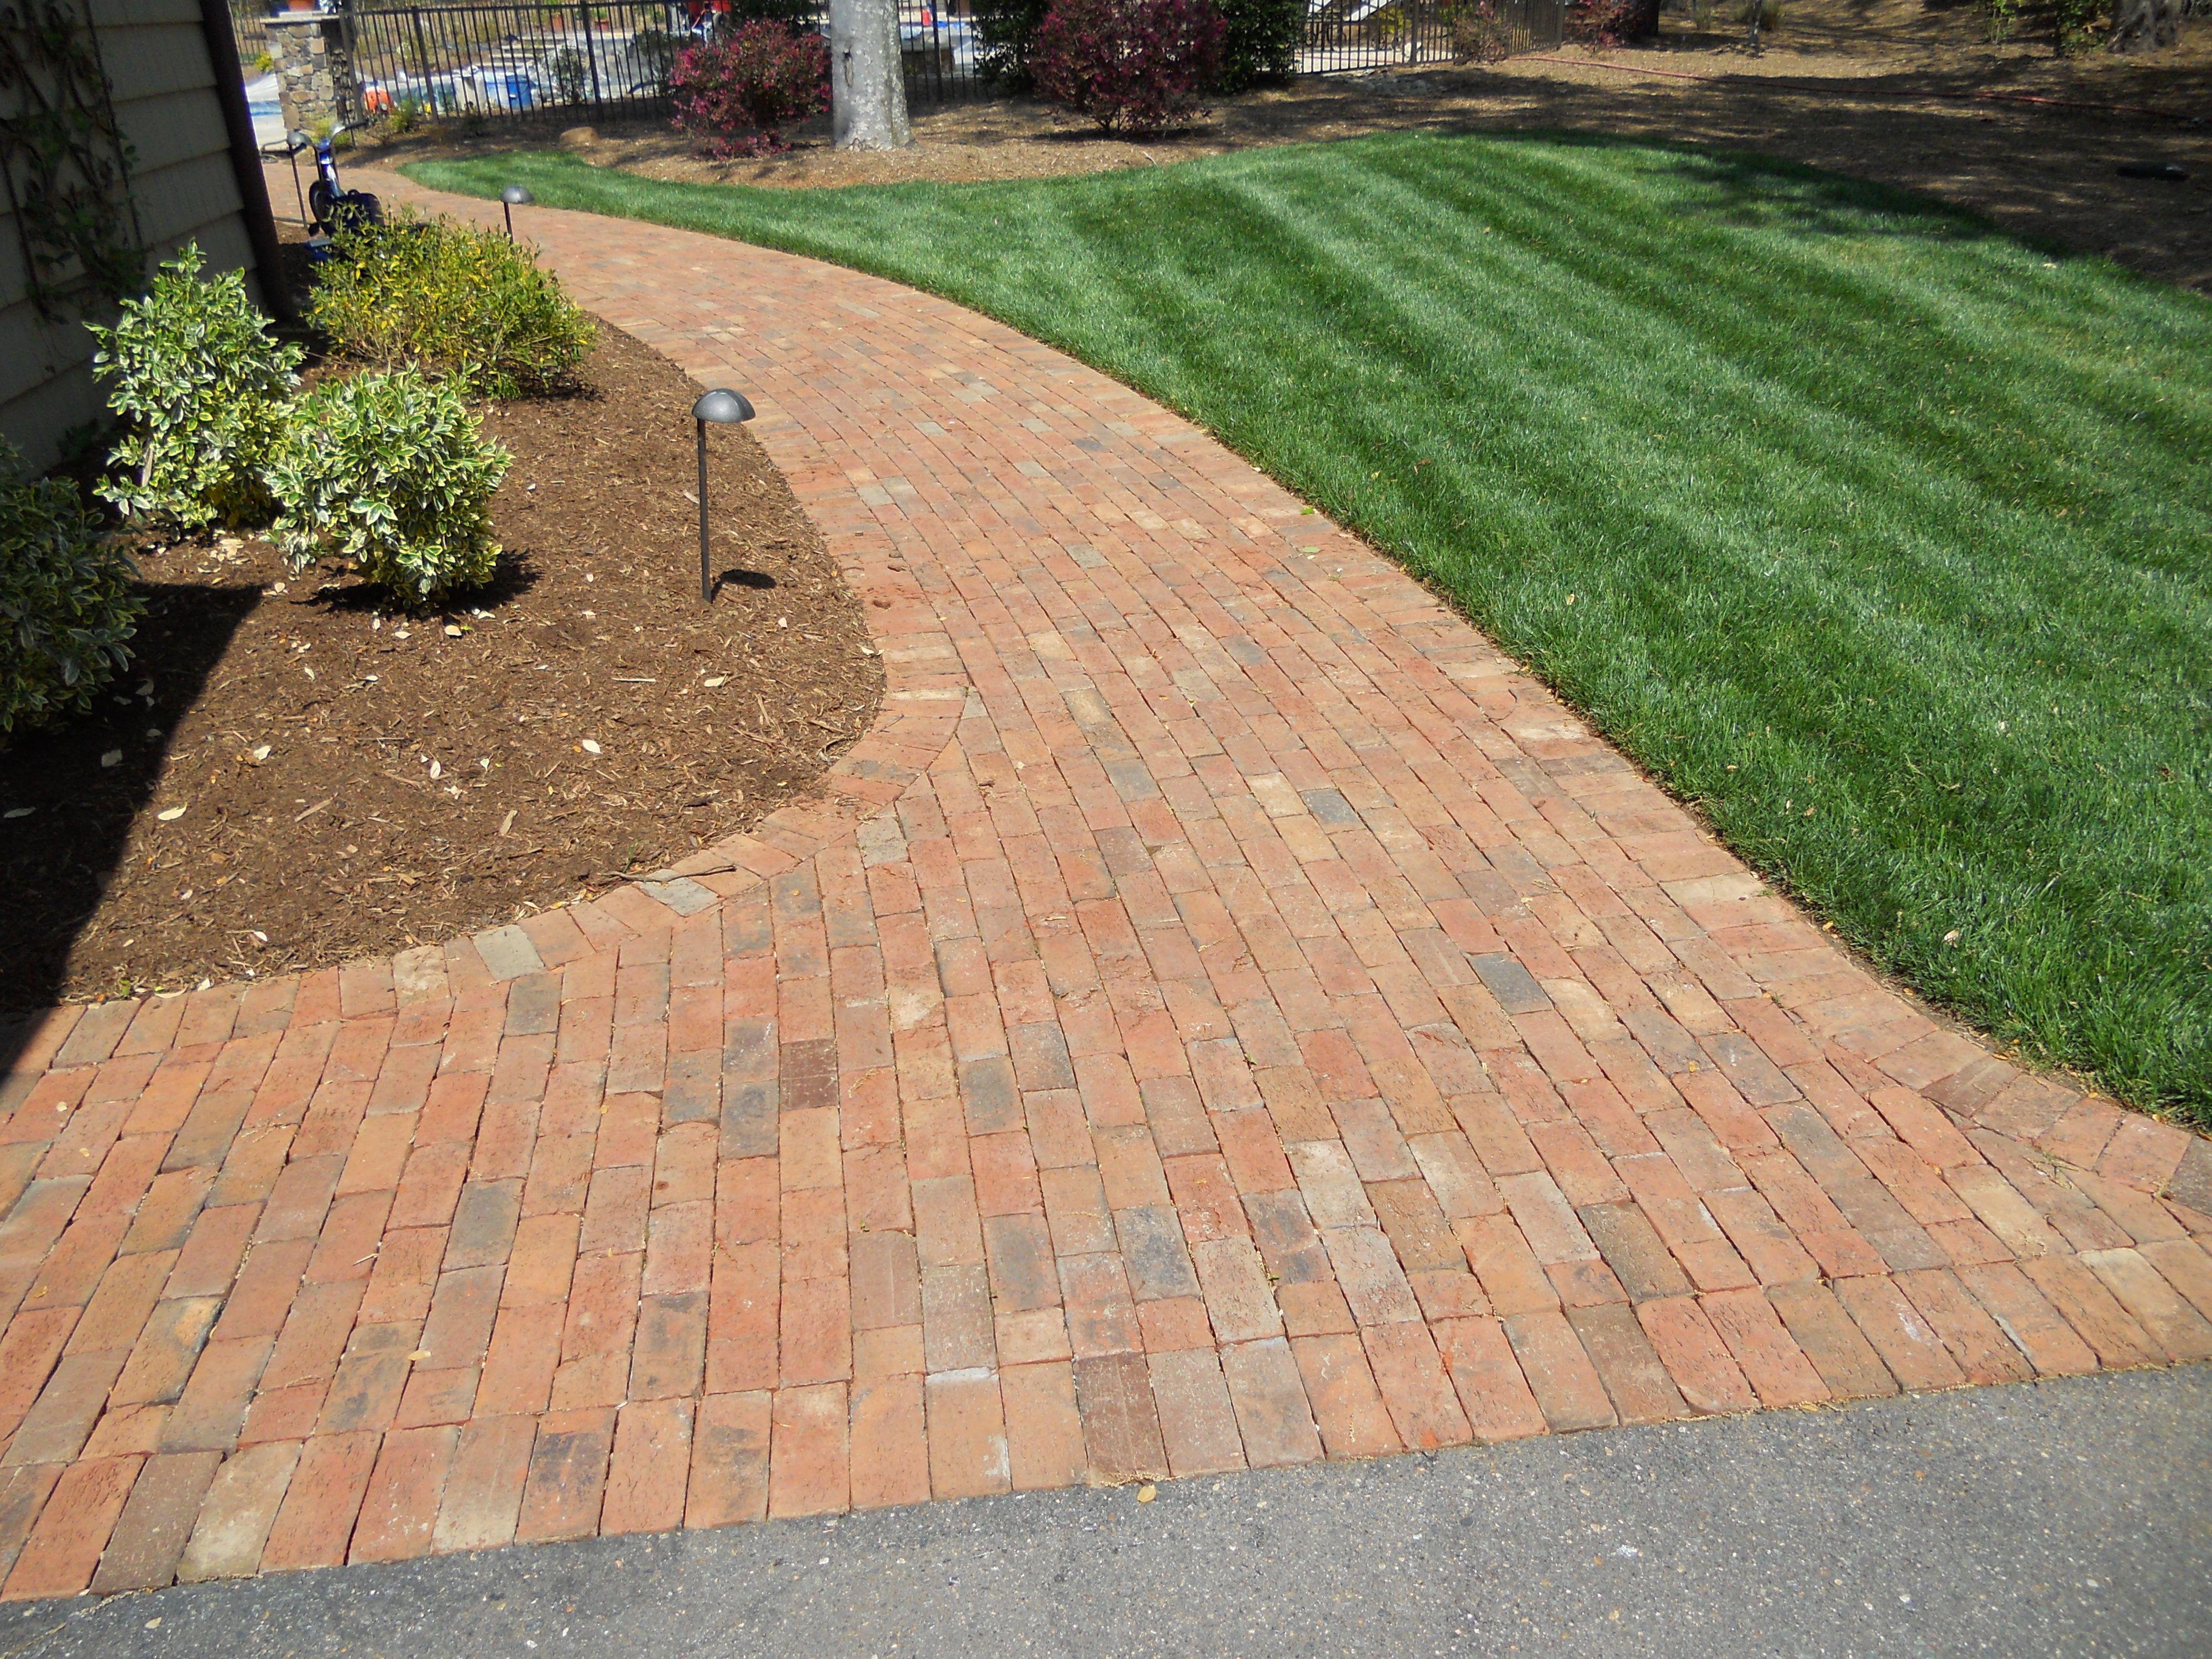 brick sidewalk | brick paver walkway | design ideas | pinterest